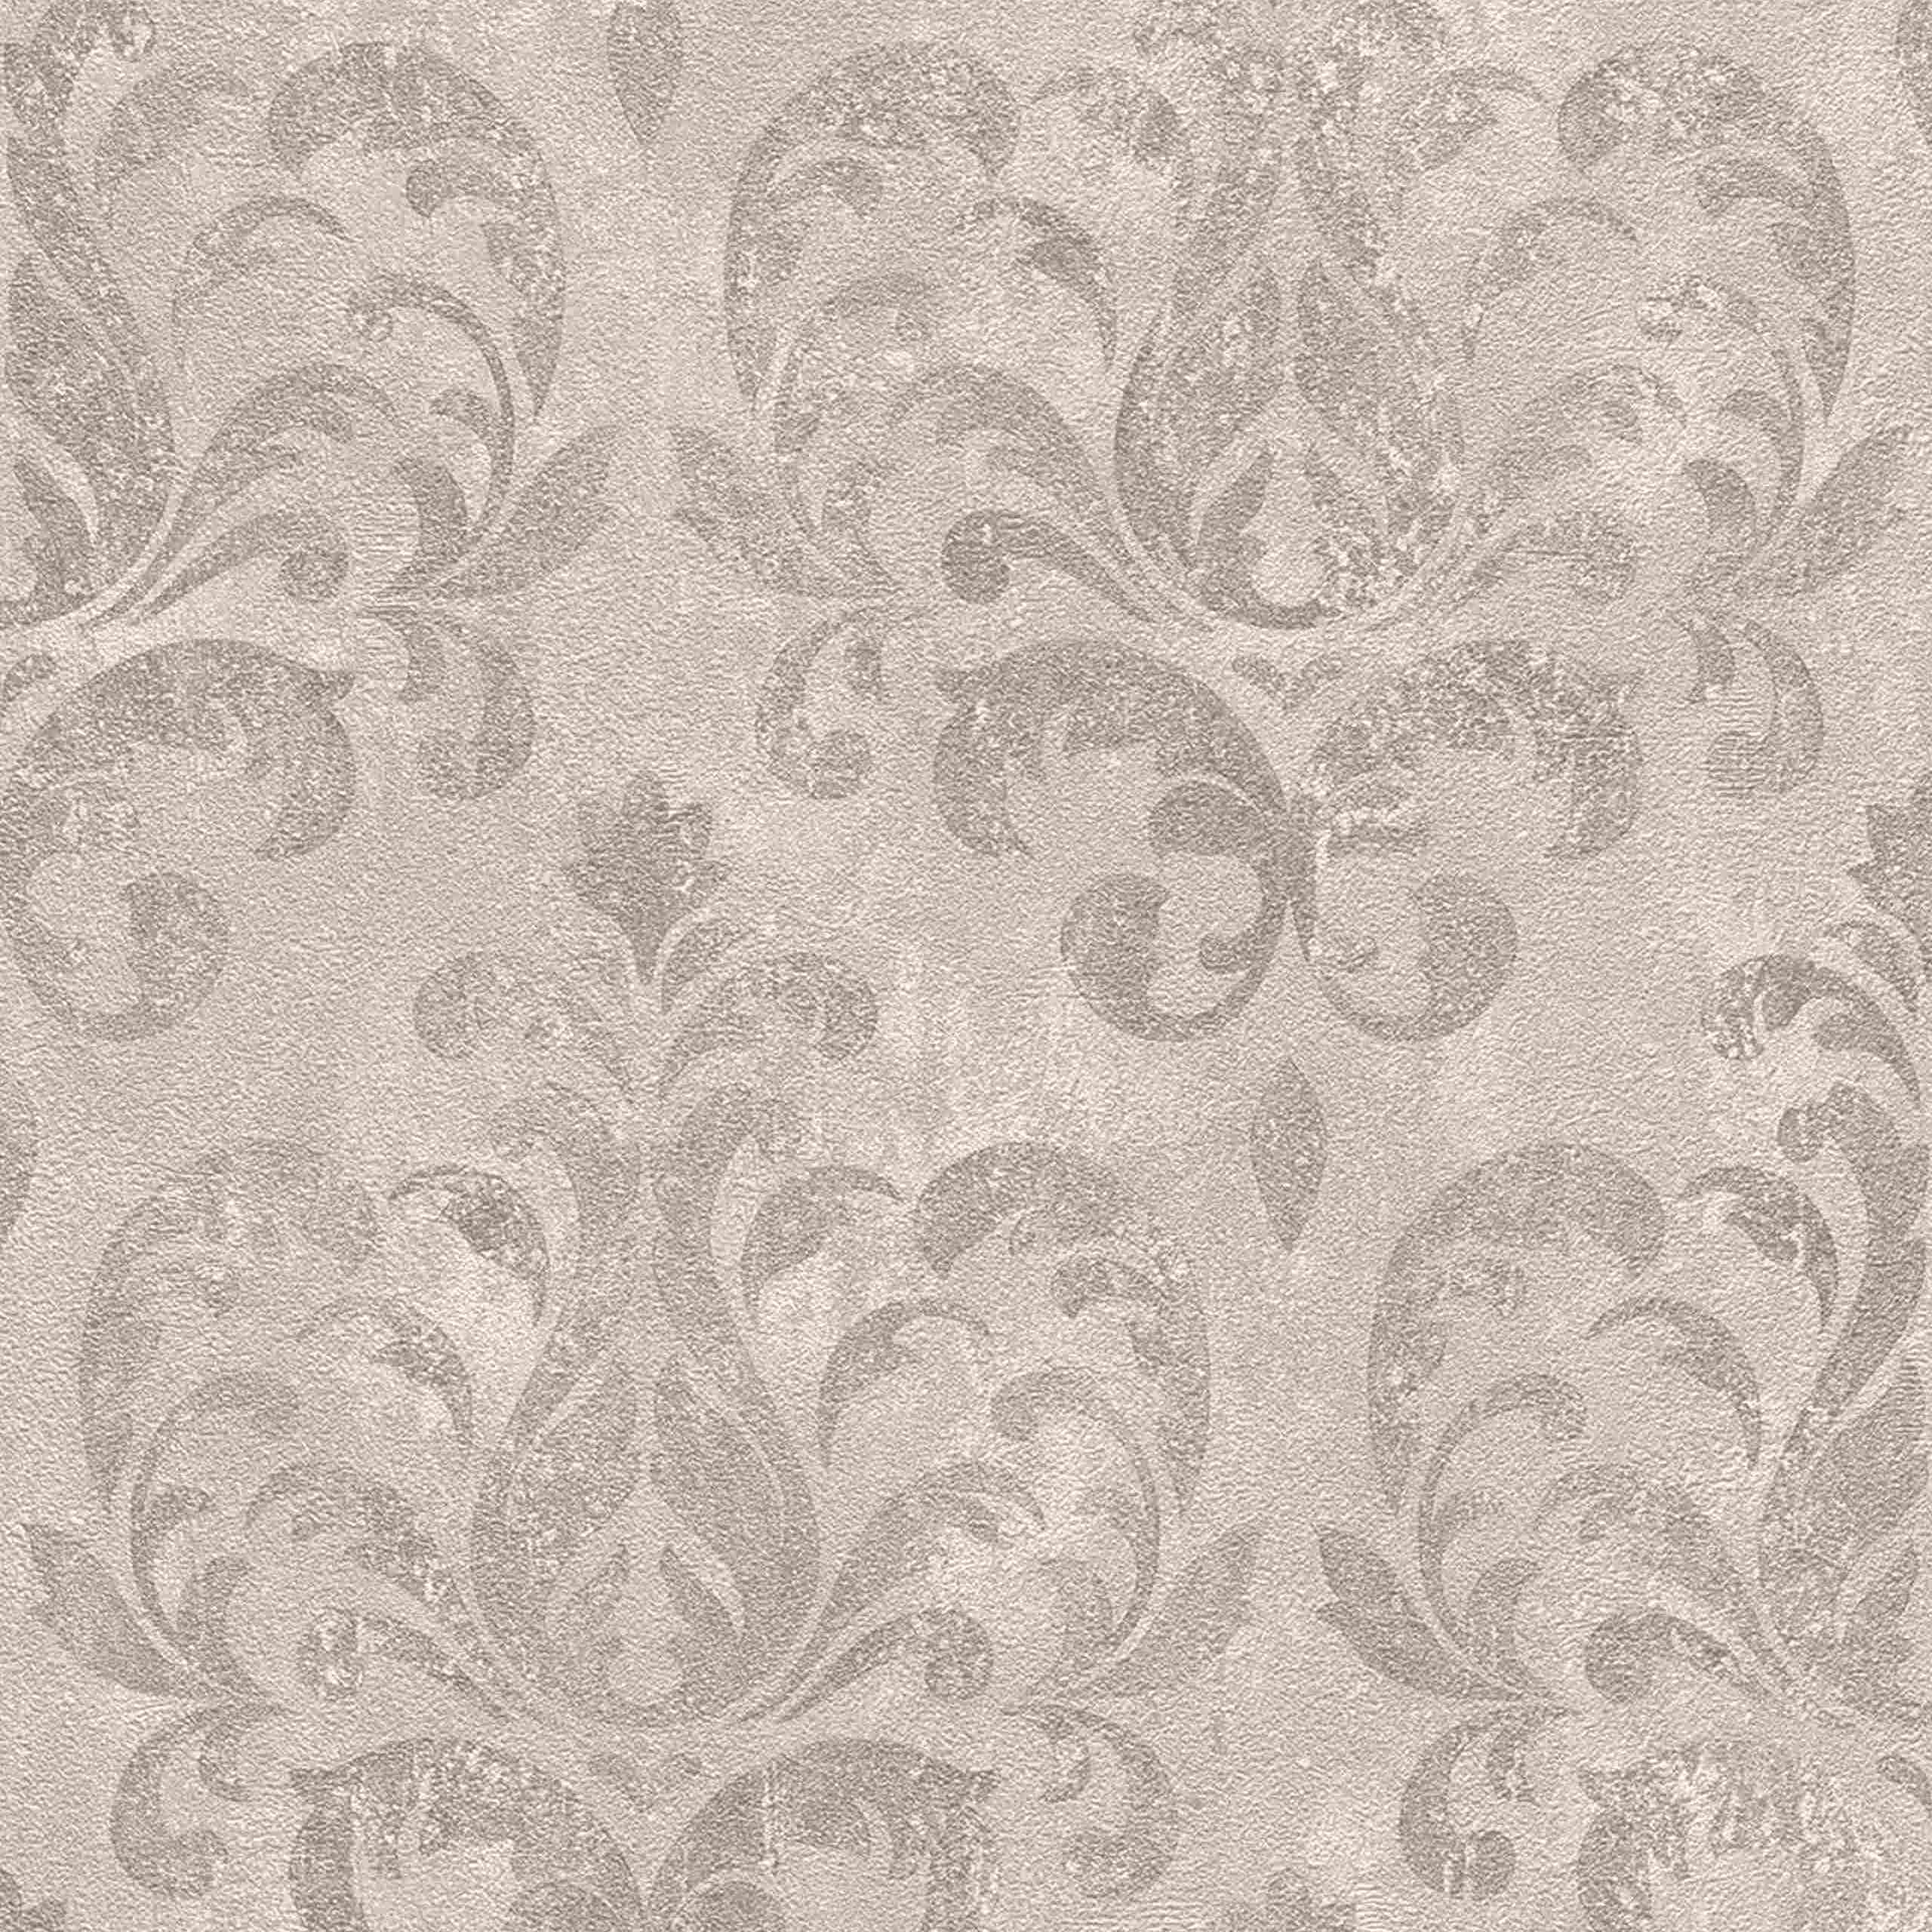 Rasch Vlies-Tapete Kollektion 'Lucera' 608526 Vintage Barock-Dekor